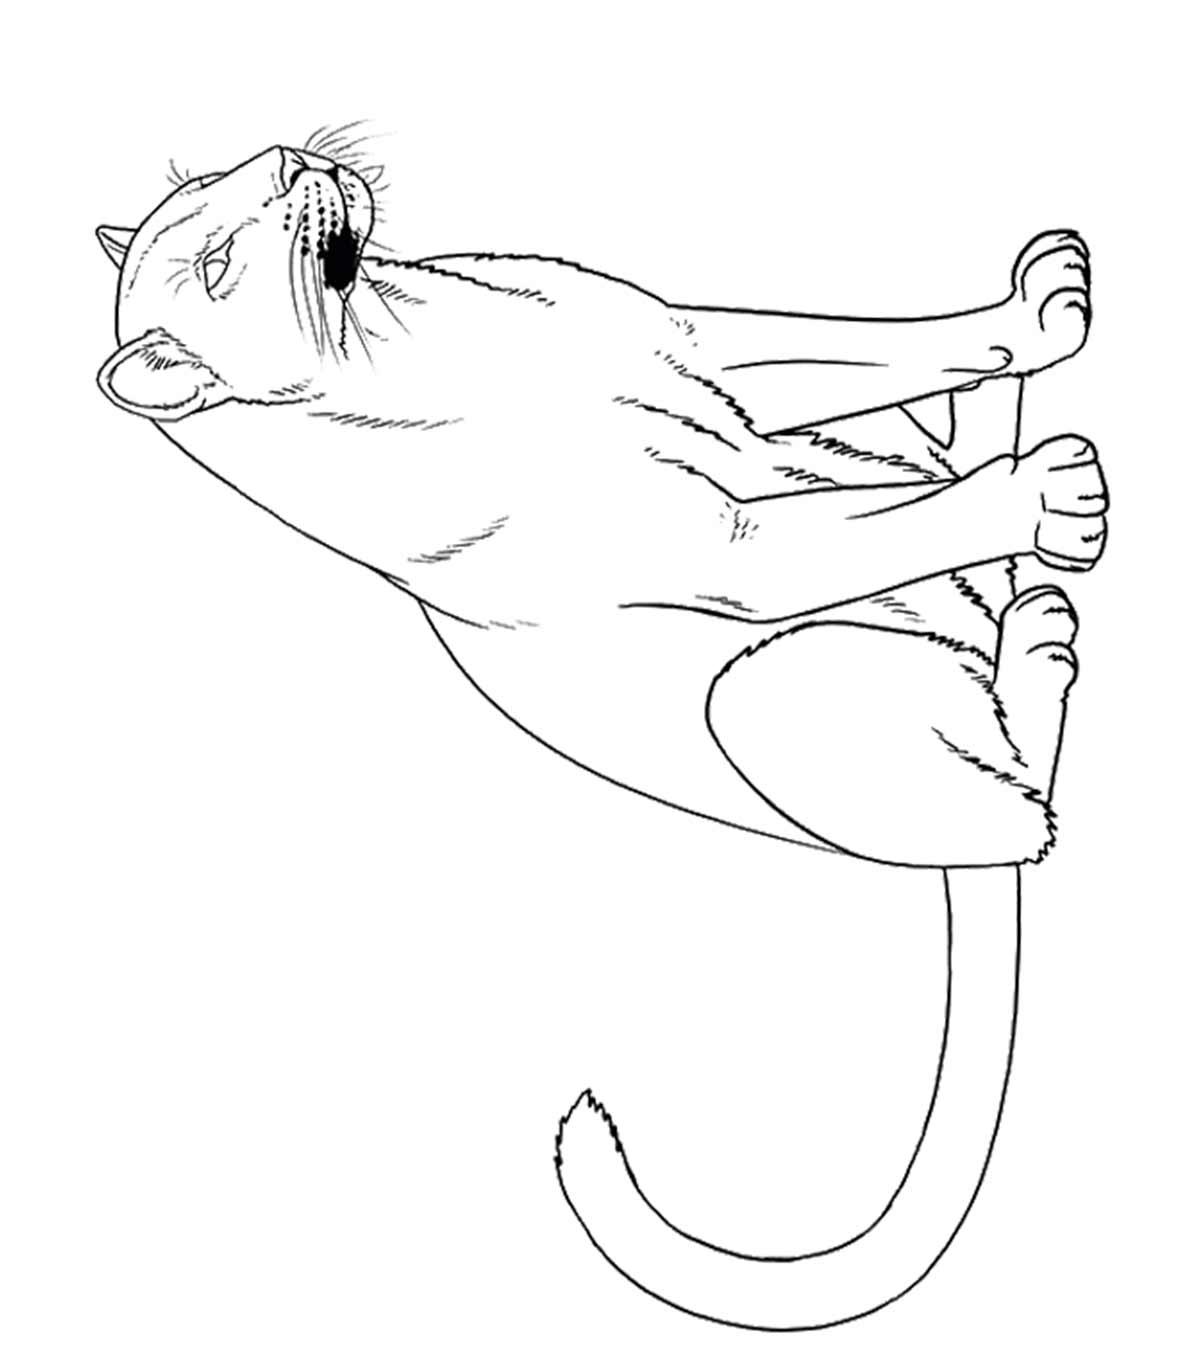 Free Orangutan Coloring Pages, Download Free Clip Art, Free Clip ... | 1350x1200